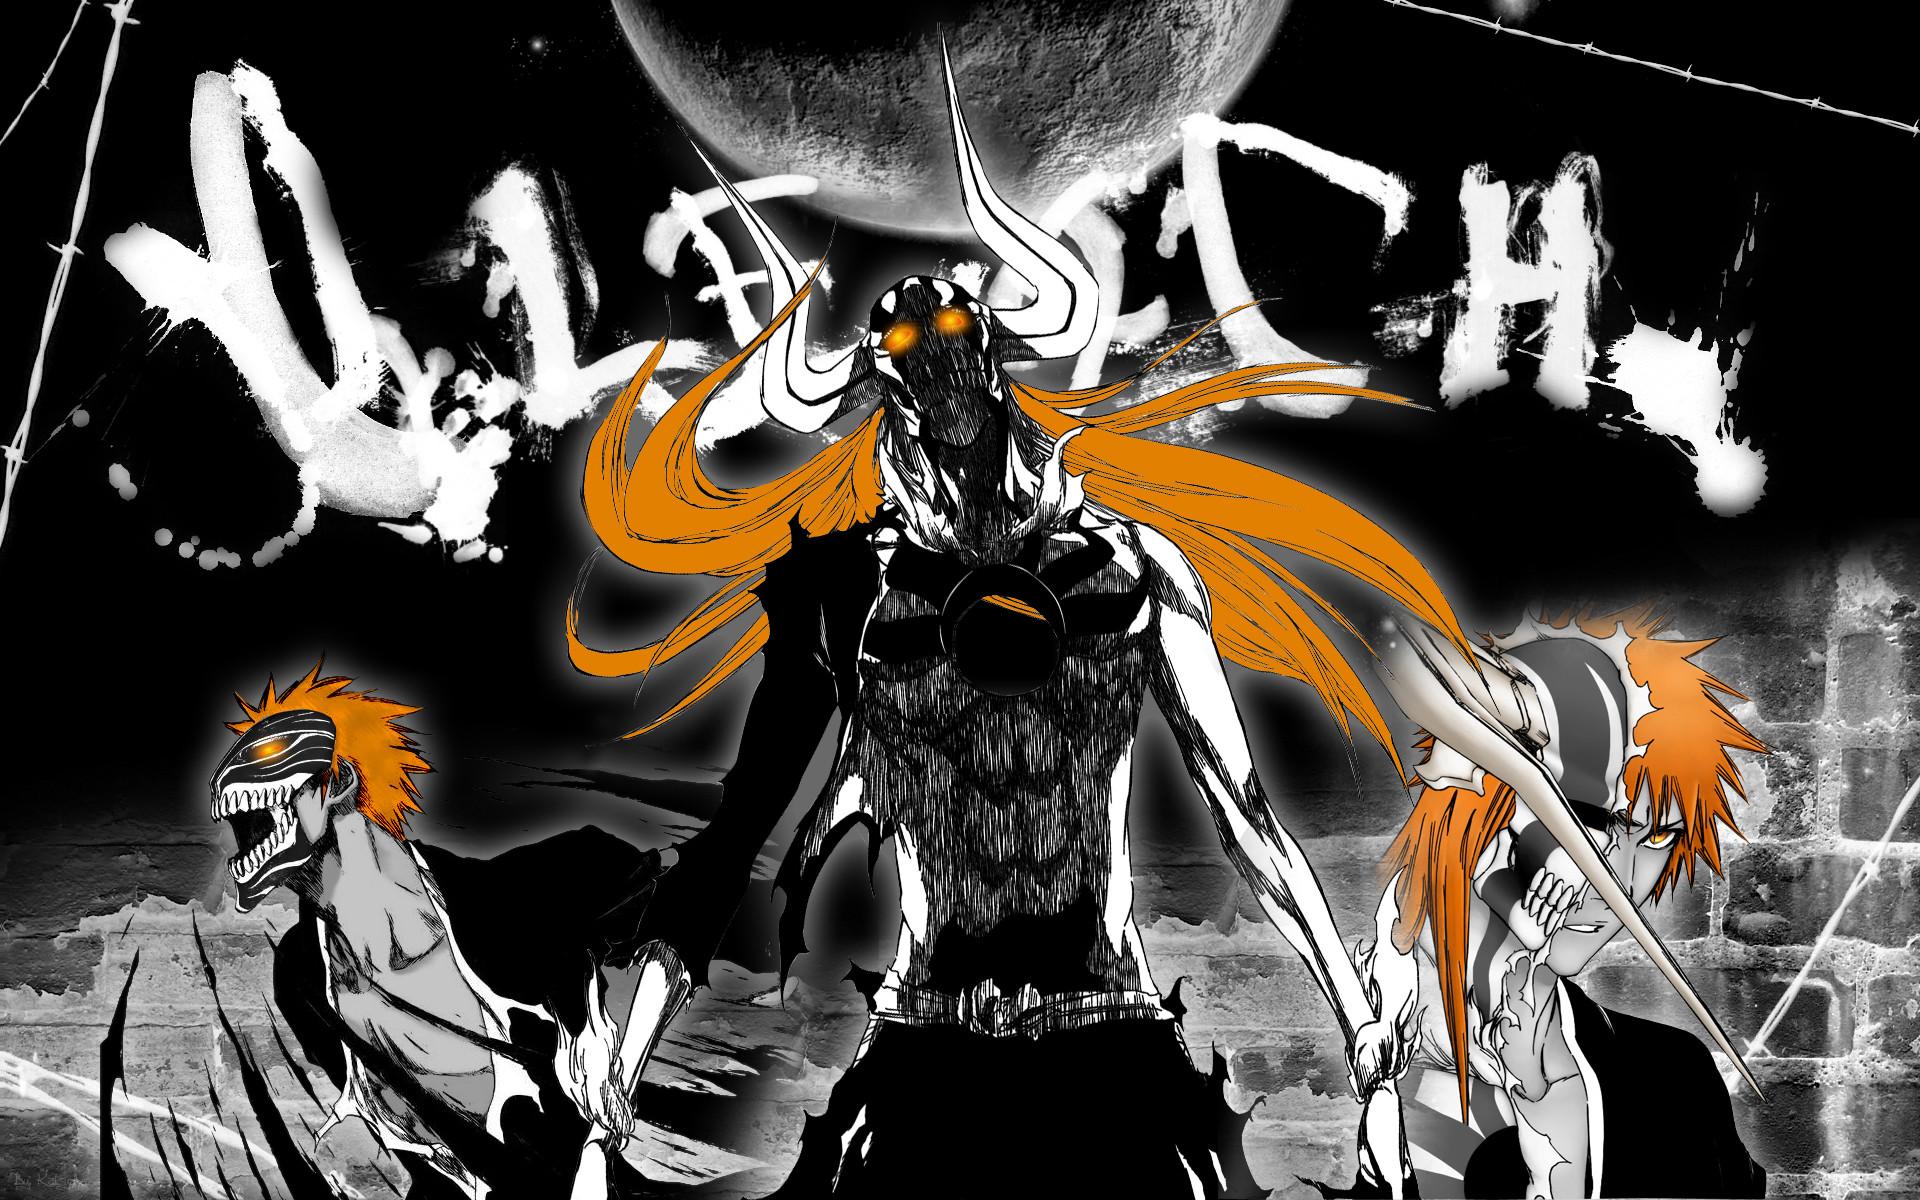 Hollow Ichigo Final Form Wallpapers Wide Hollow Final Form Bleach Hollow Vs  Aizen New Transformation Kurosaki Form 3 Hollow Vs Naruto Kyubi Gif :  Archived …